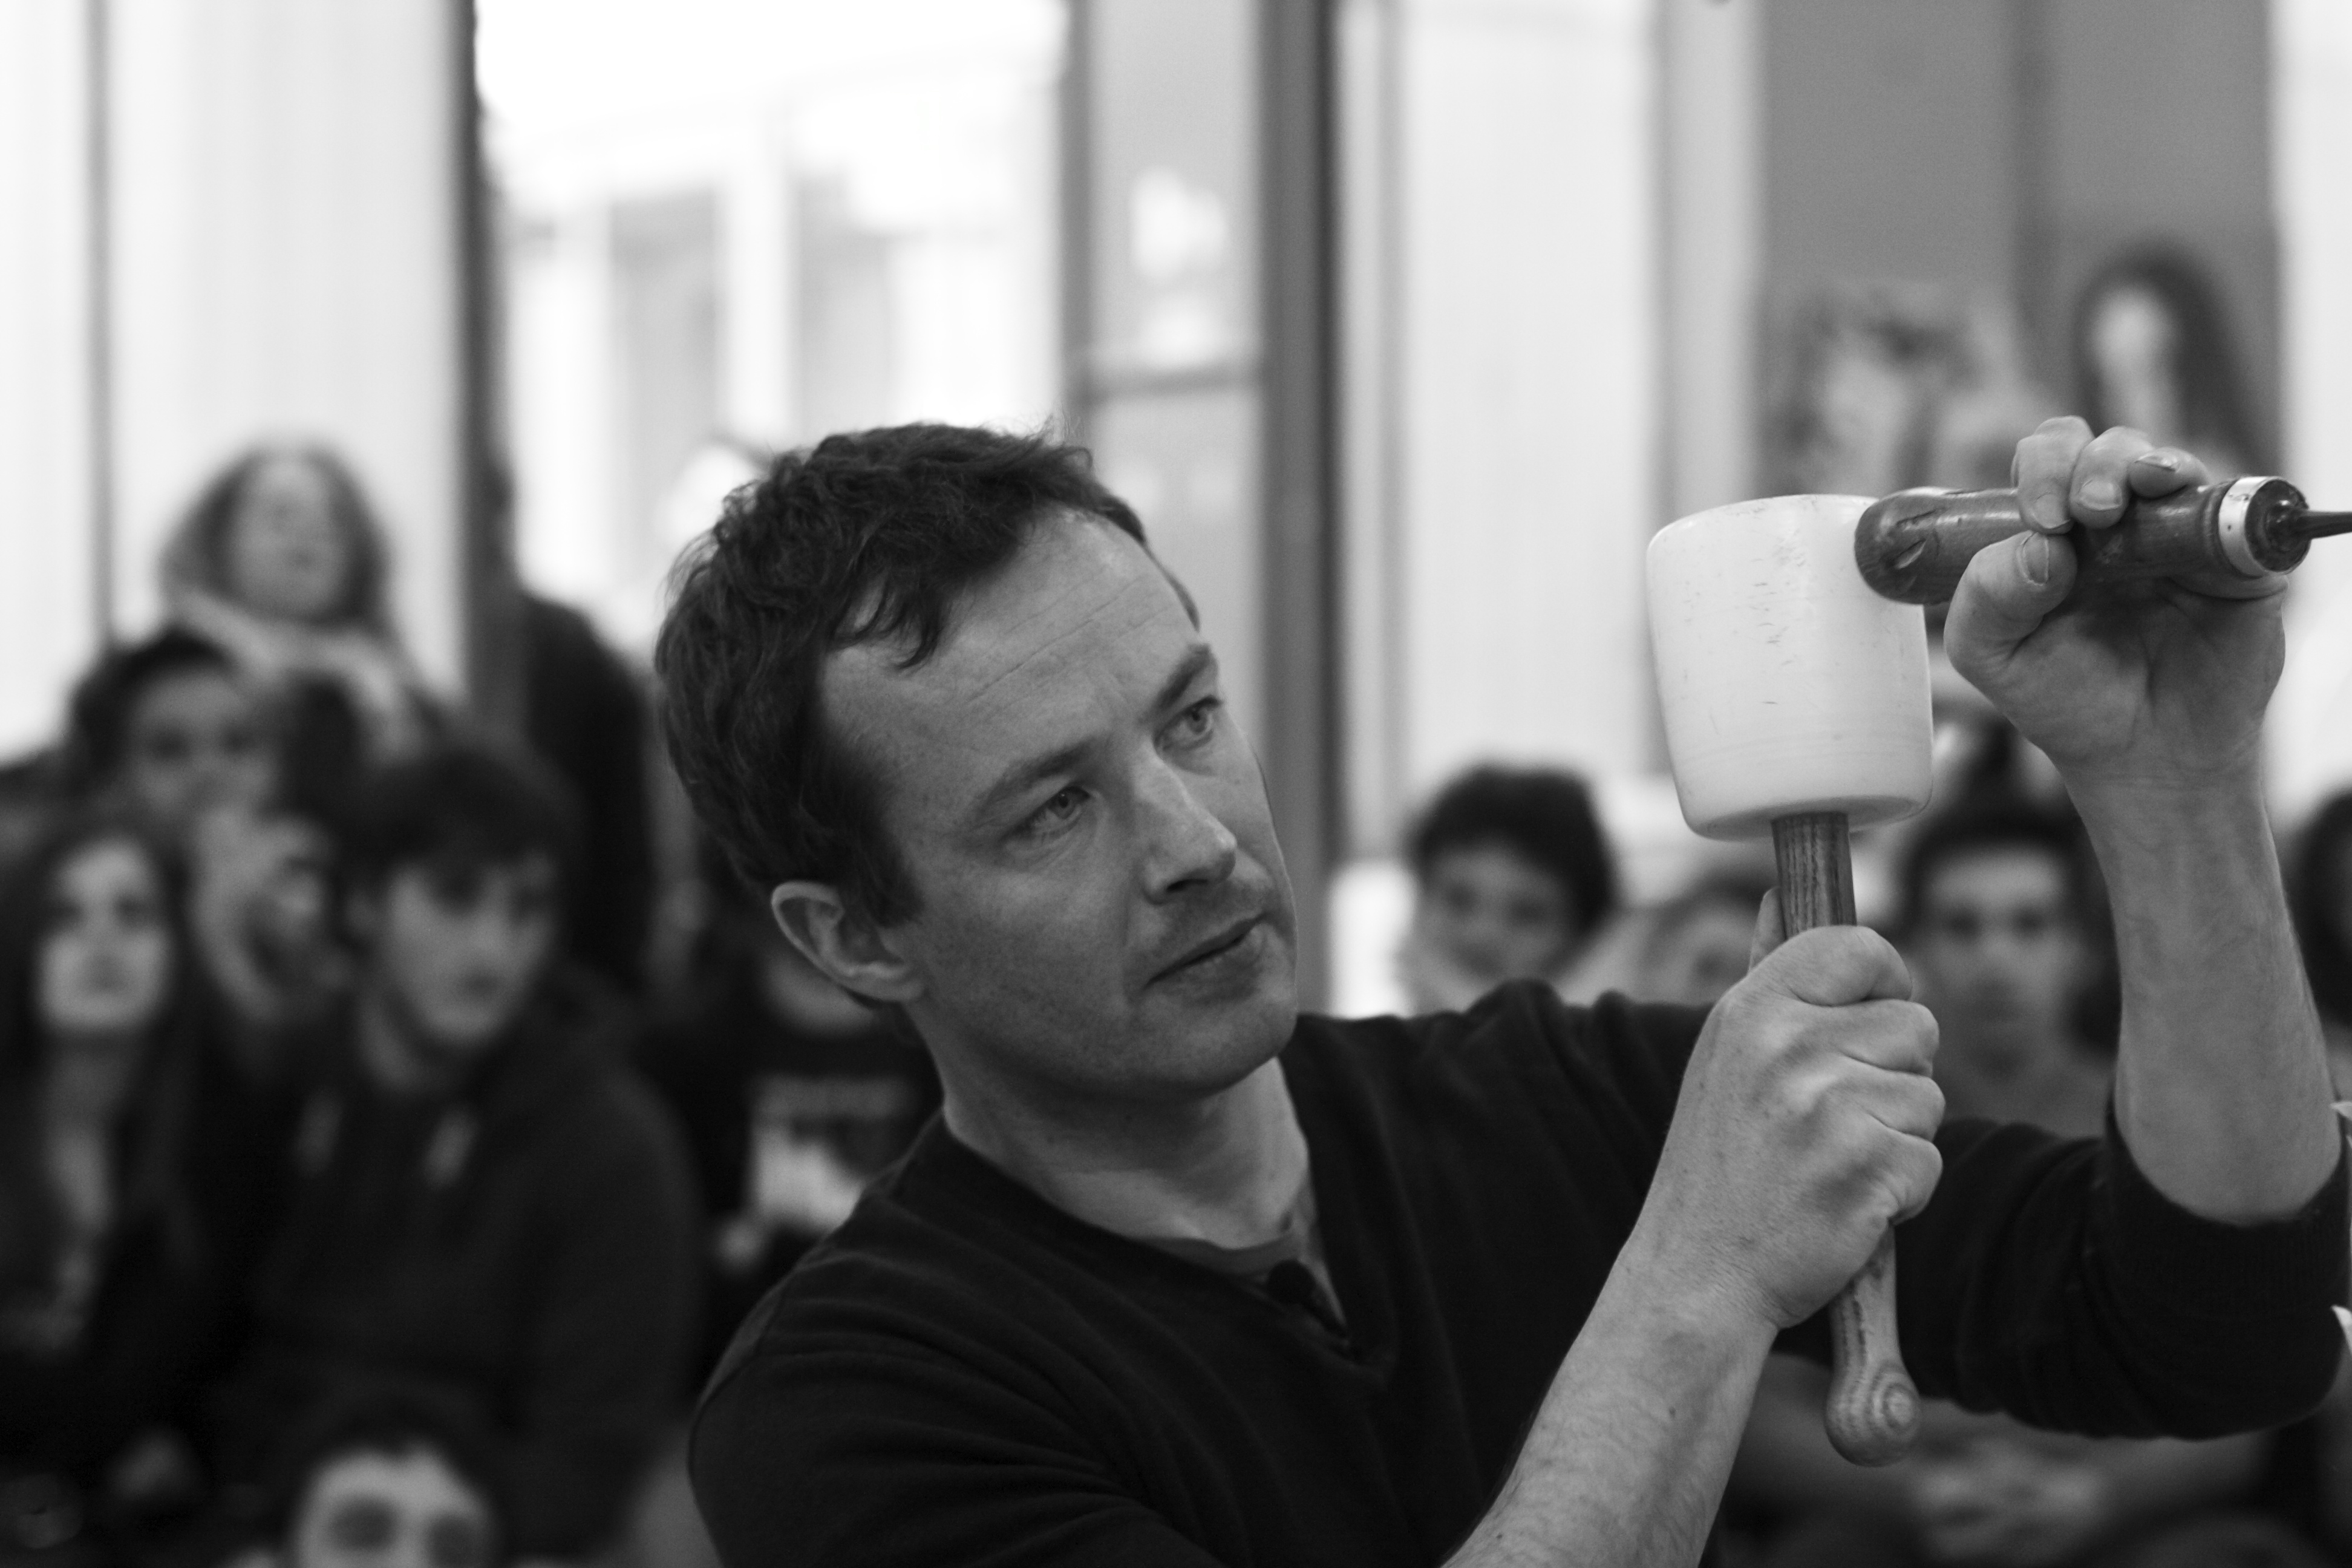 Flickr - Aron Demetz - Dialoghi e materia - Workshop a cura di Franco Reina69